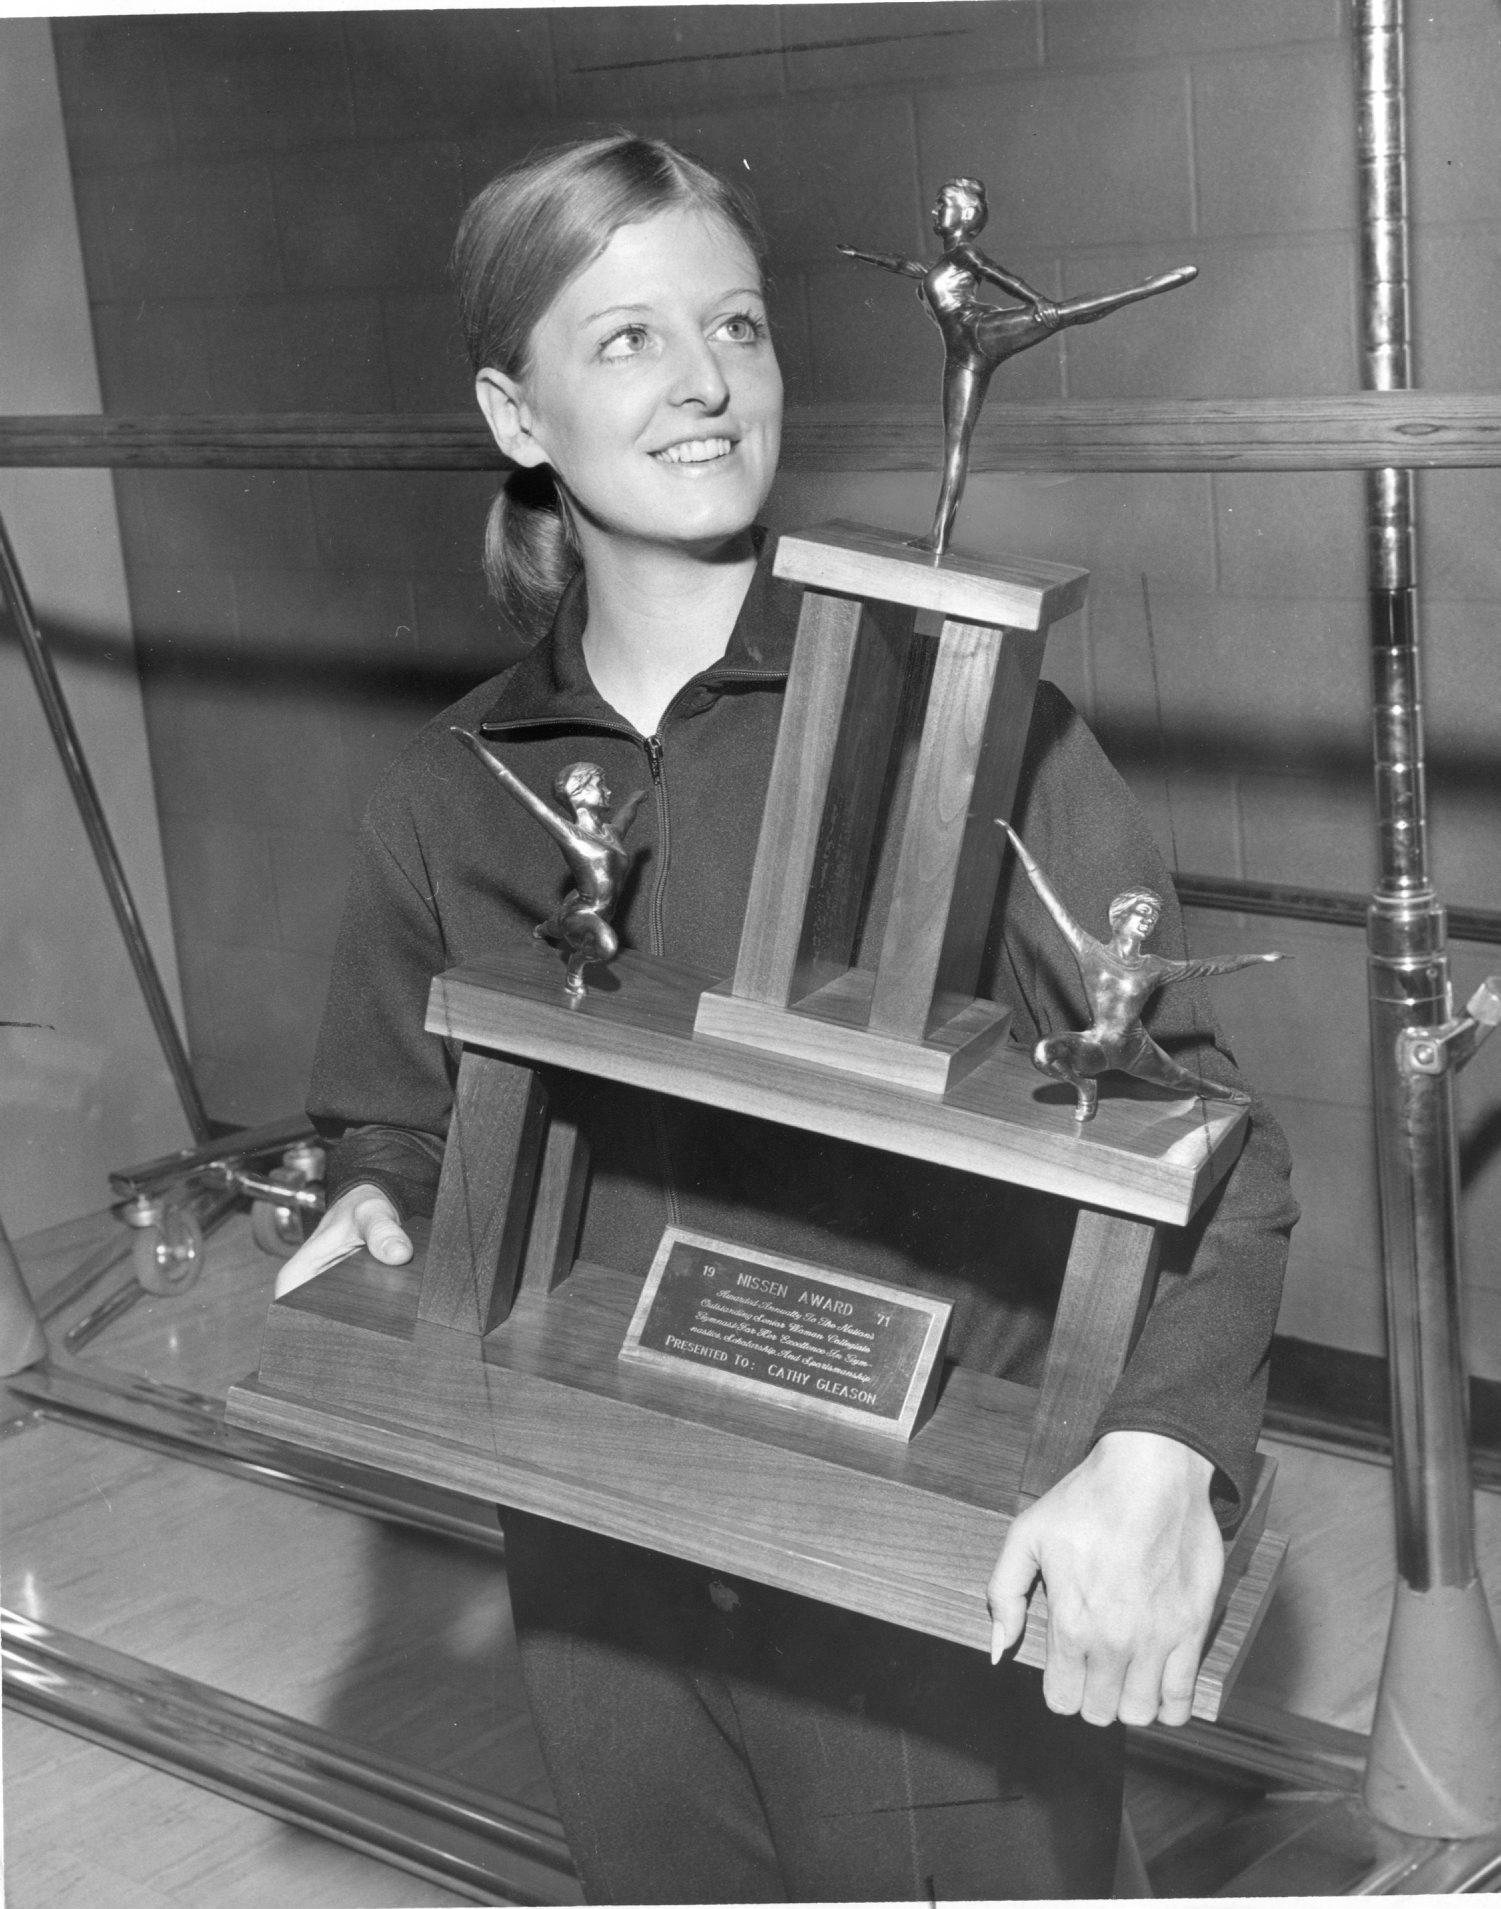 Buffalo's Best / No. 5 Female: Kathy Gleason-Jachter